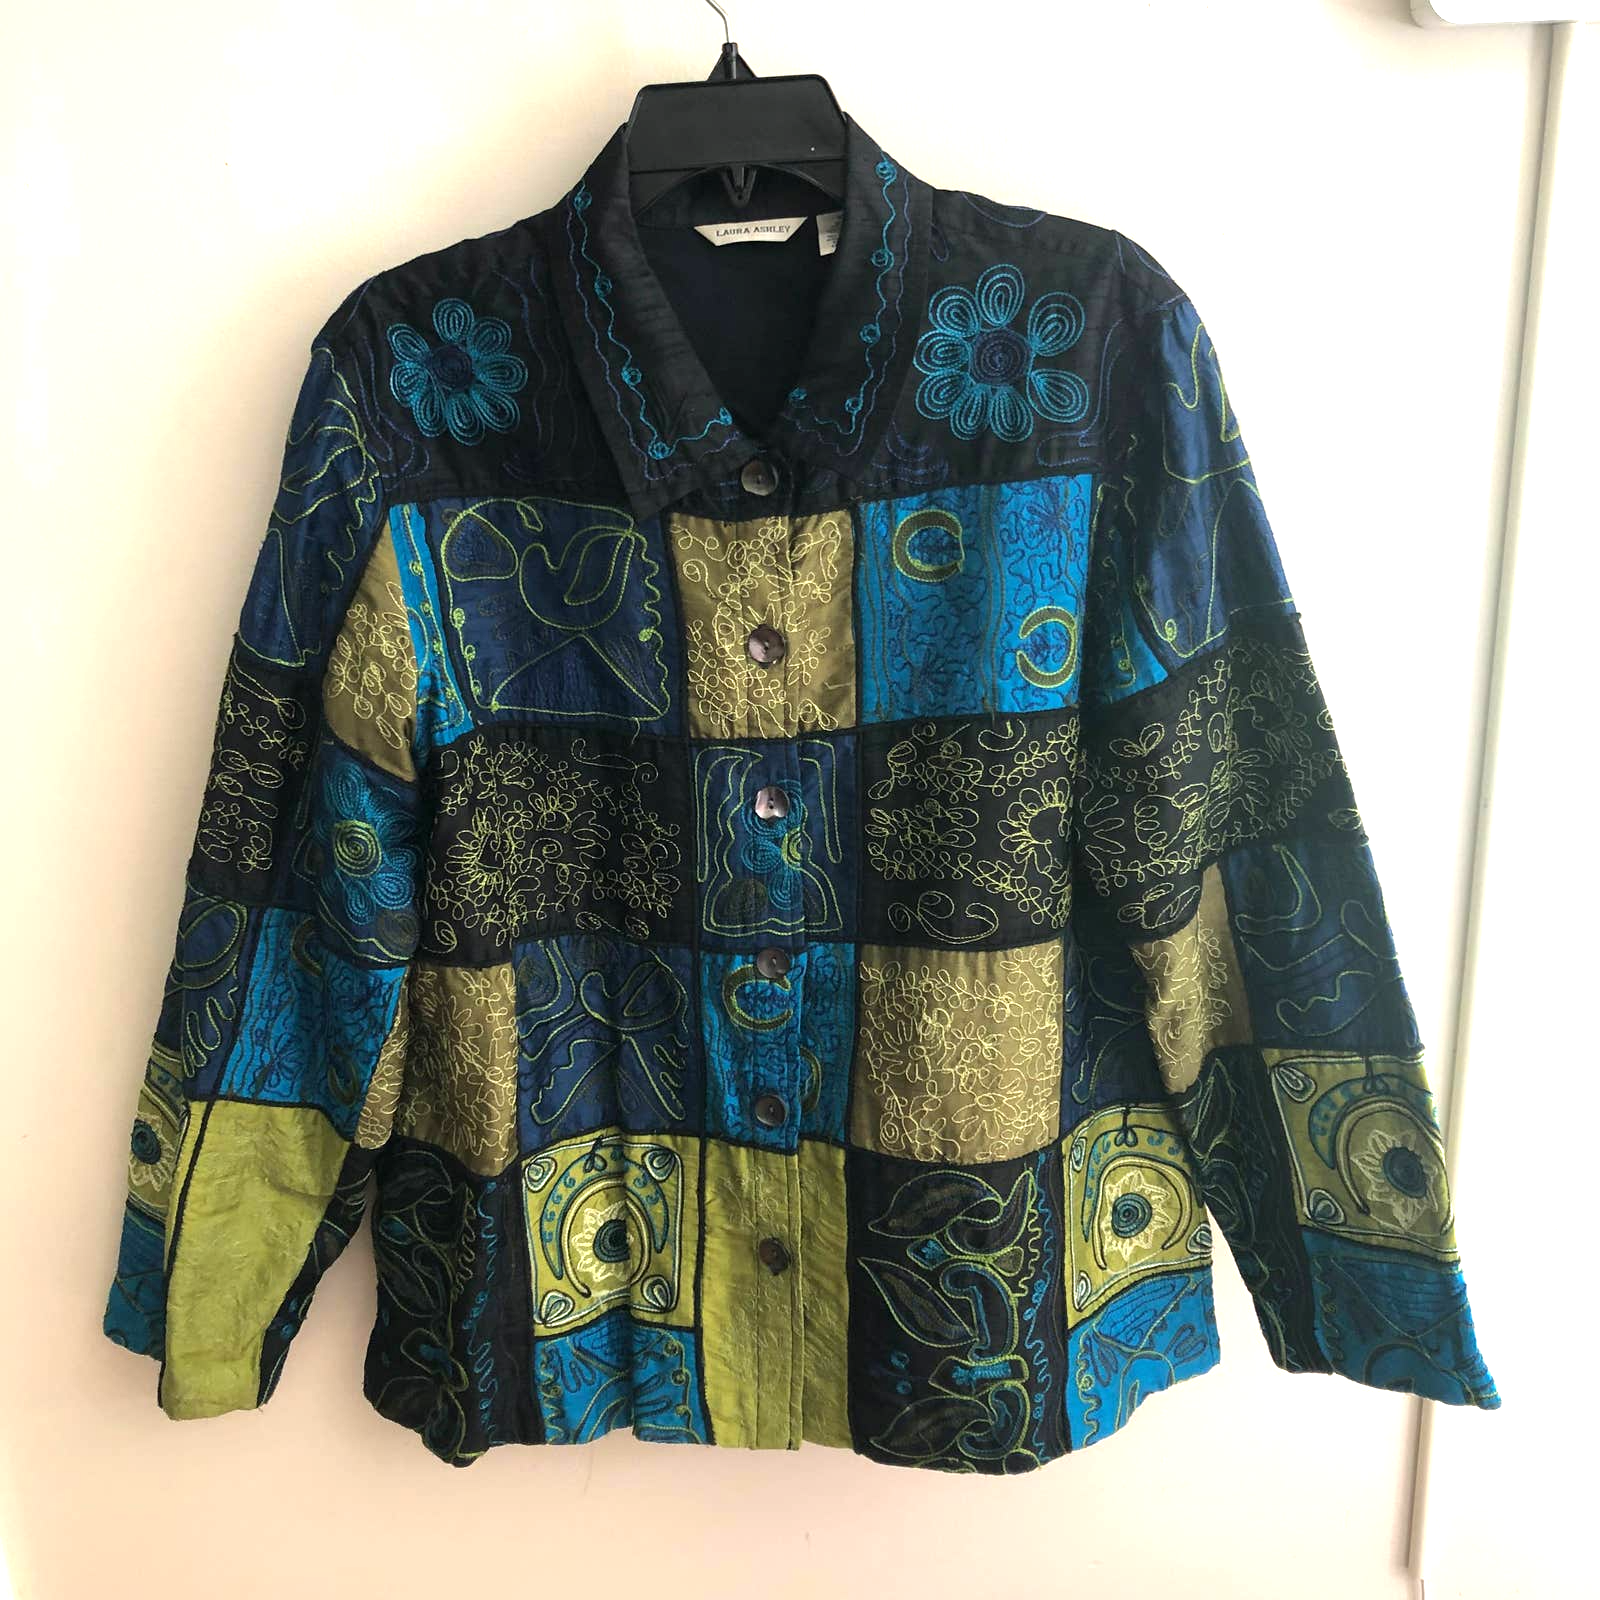 Women Laura Ashley 100% Silk Patchwork Jewel Jacket Wearable Art XL Green Blue